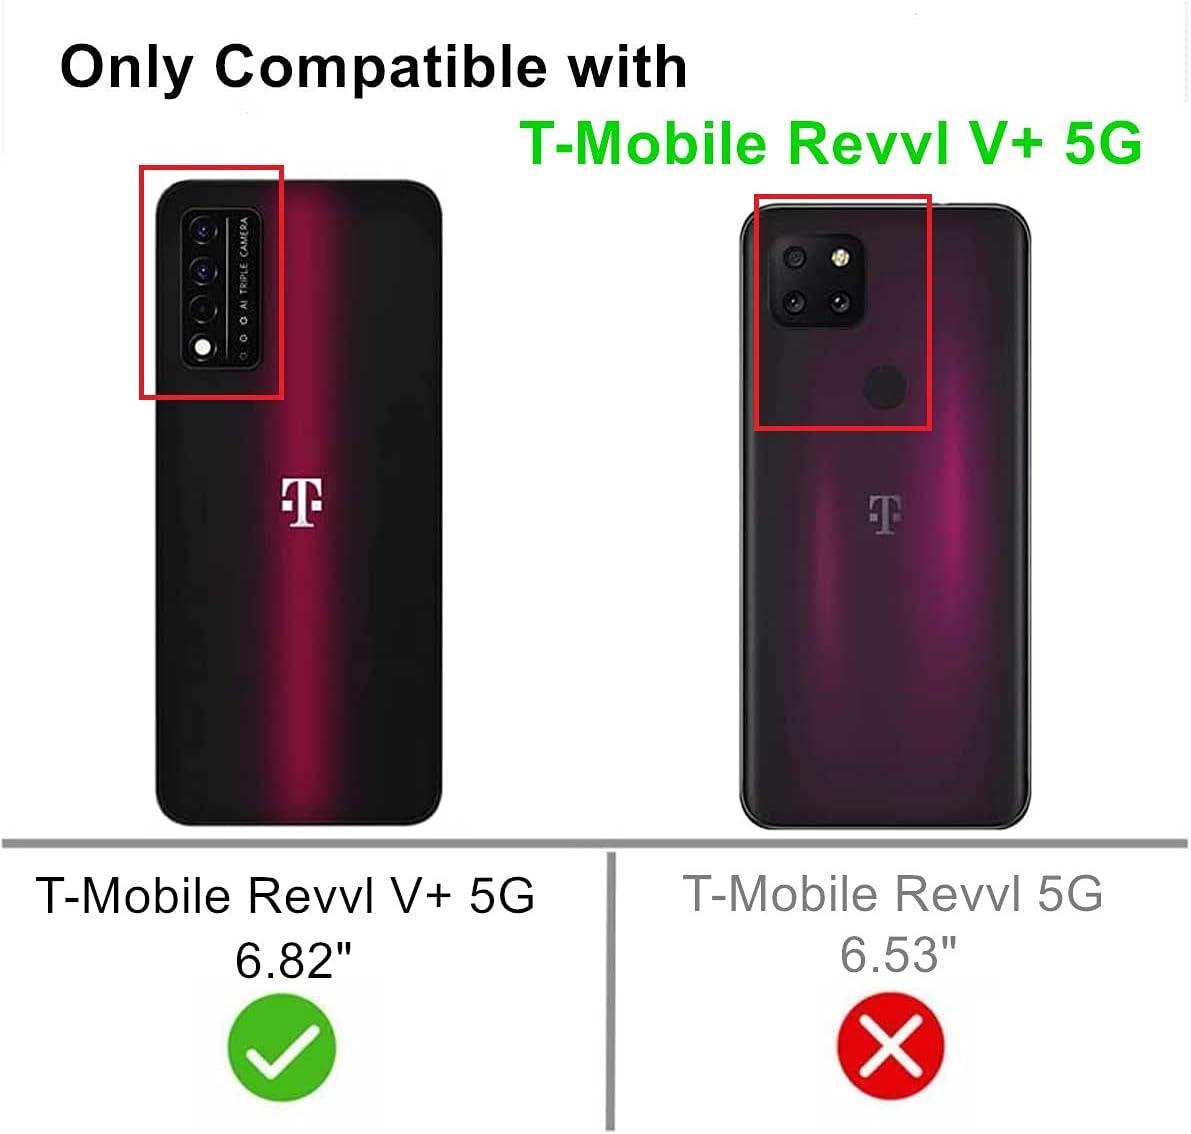 FollmeAir for T-Mobile Revvl V+ 5G Case, TCL Revvl V+ 5G Case, Slim Flexible TPU for Girls Women Airbag Bumper Shock Absorption Rubber Soft Silicone Case Cover Fit for T-Mobile Revvl V+ 5G (Clear)